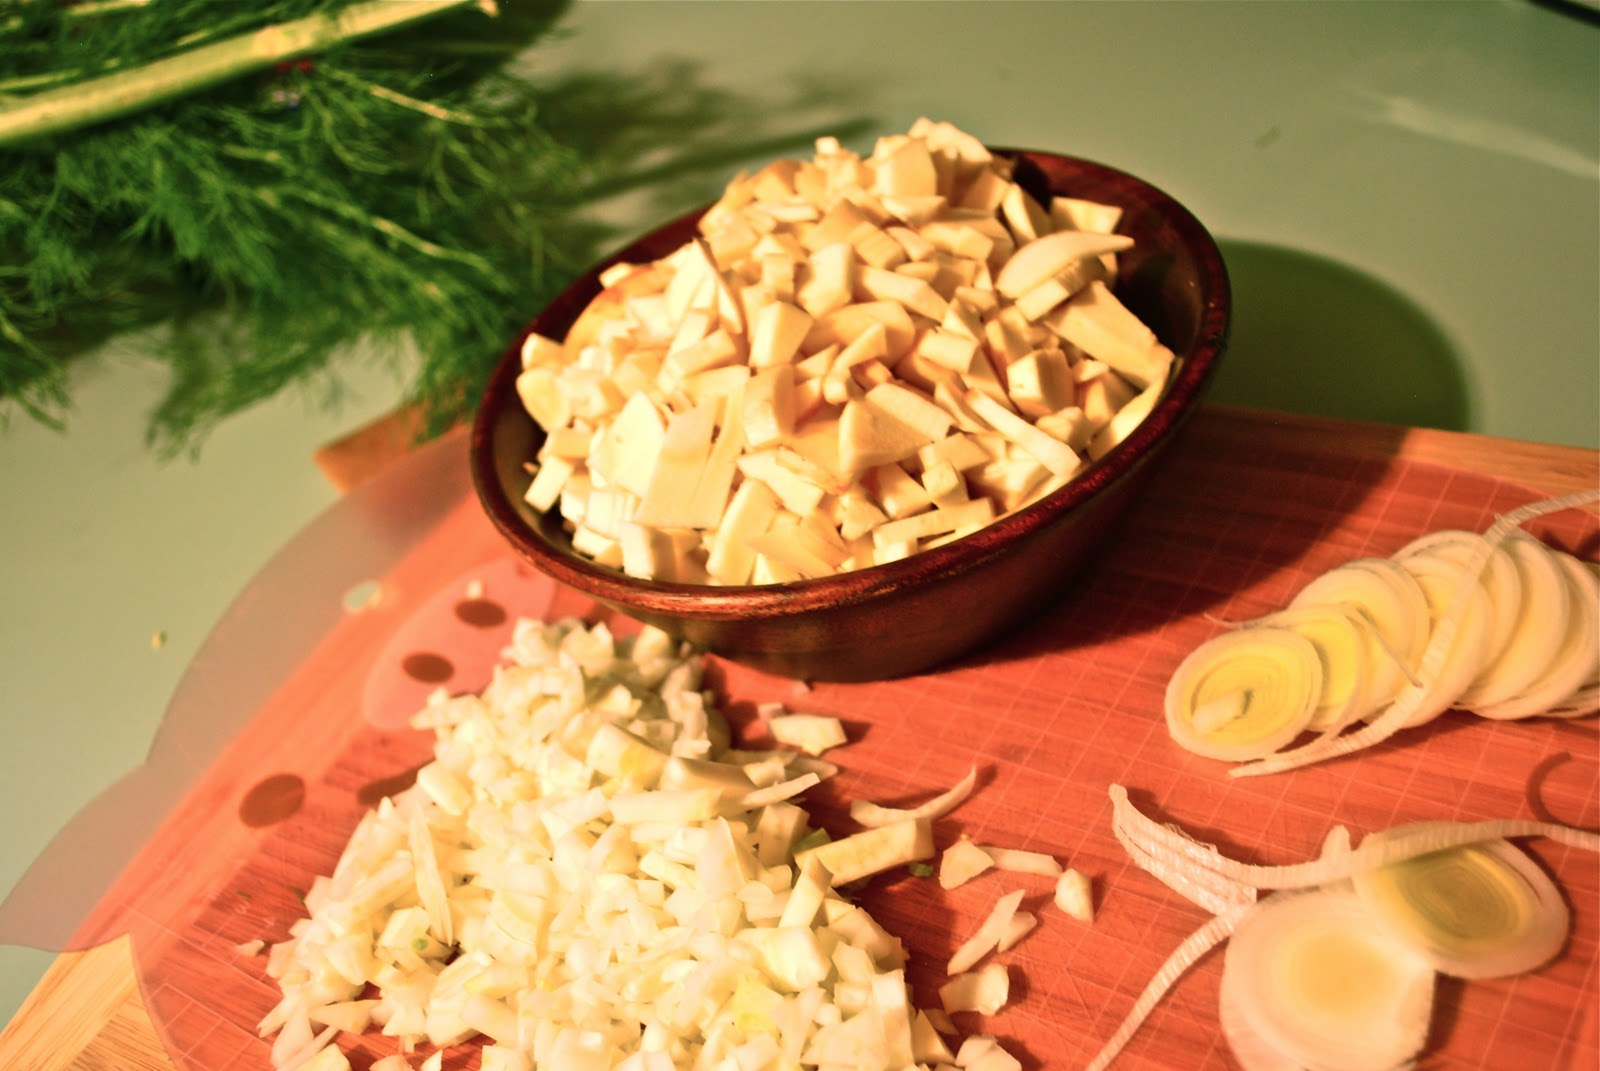 ... bird: The Kitchen Project week 4 - Salmon, Fennel and Parsnip stew